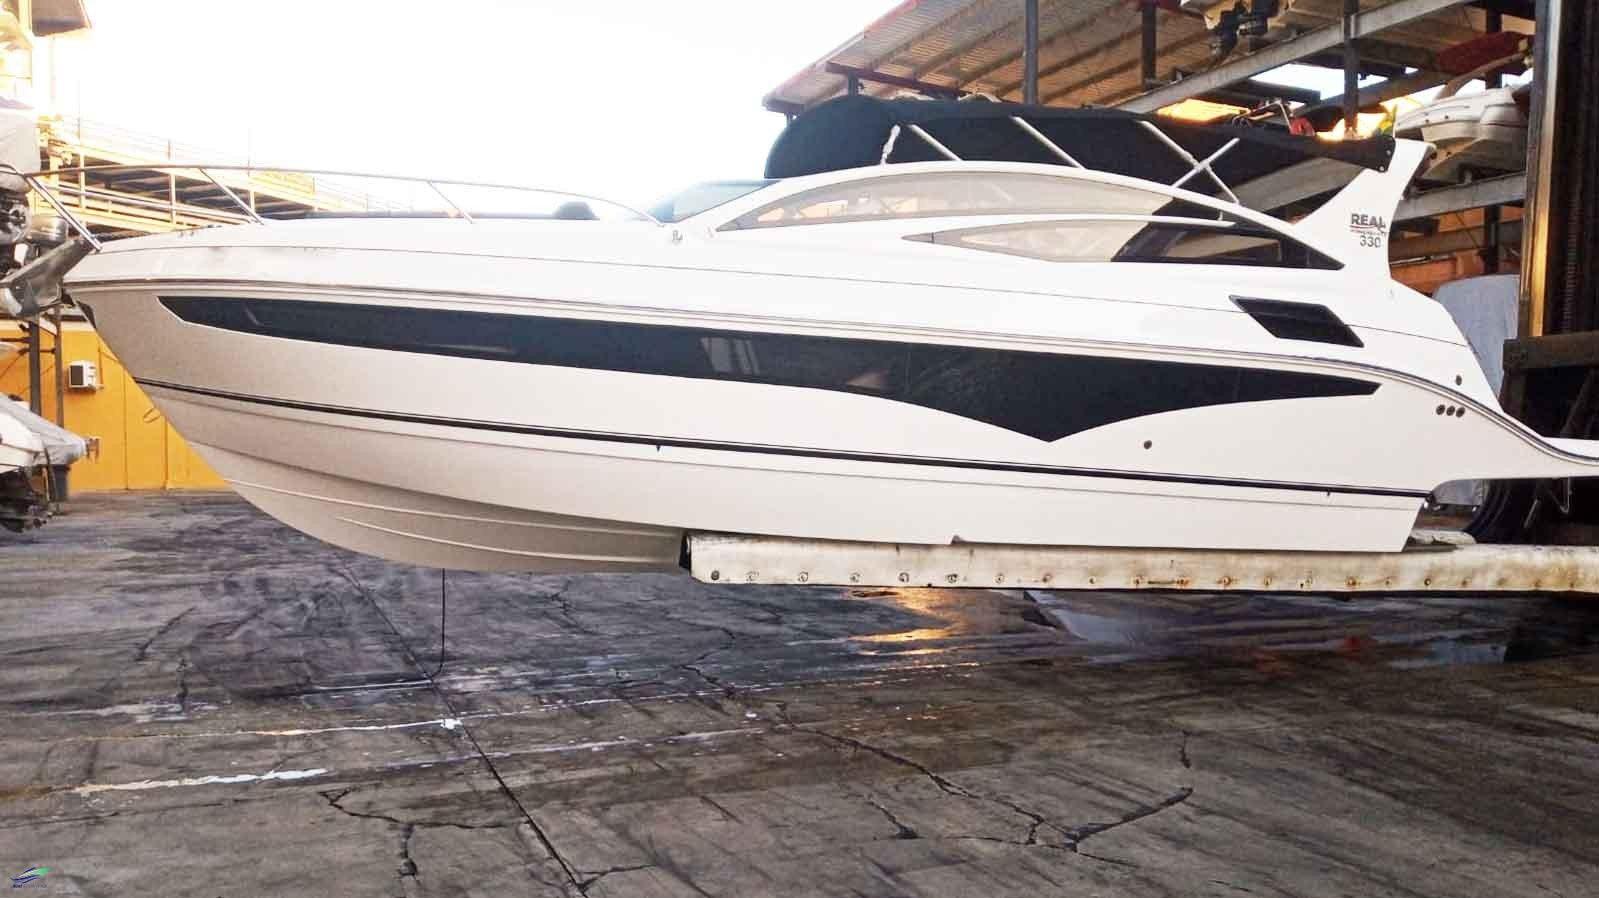 Real Powerboats Real 330